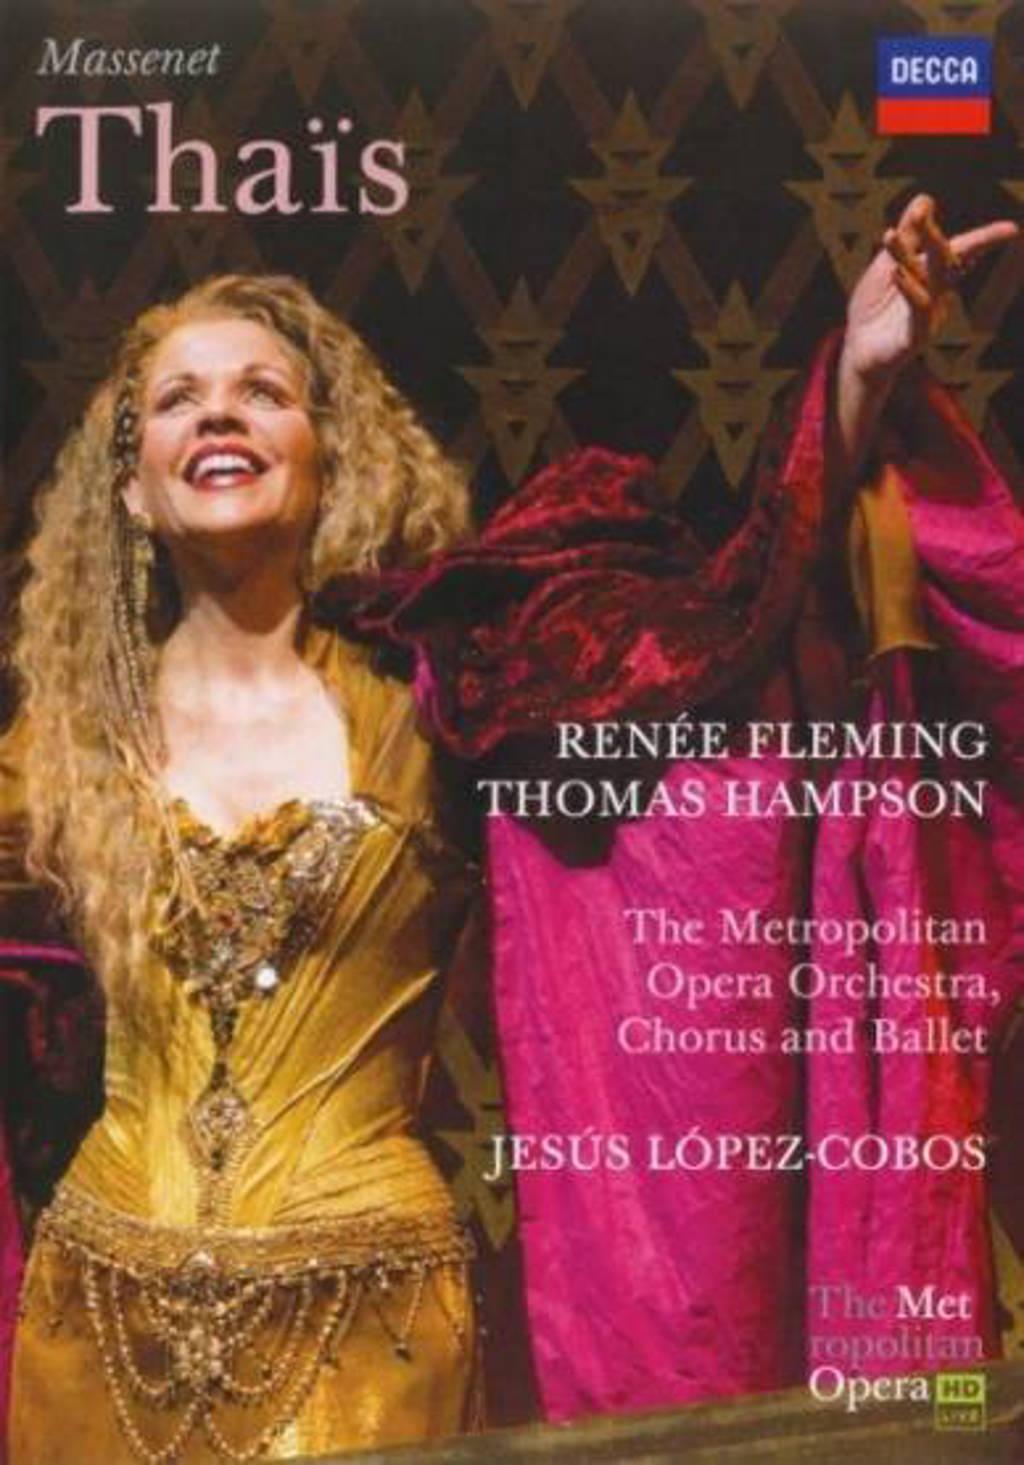 Renee Fleming - Thais (DVD)